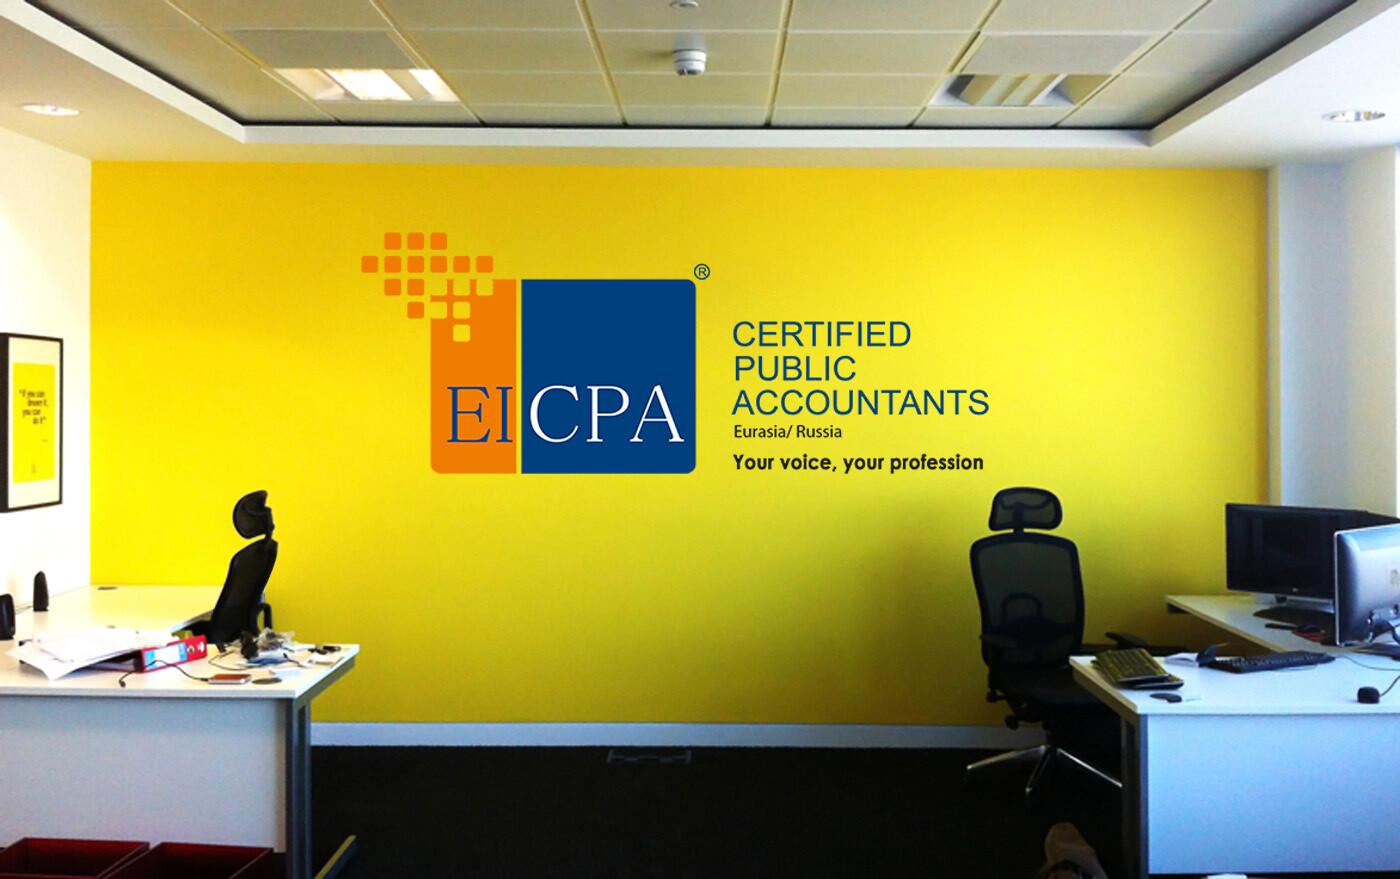 CertTAX - CPA Certificate in Taxation (Rus) | Сертификат по налогообложению России